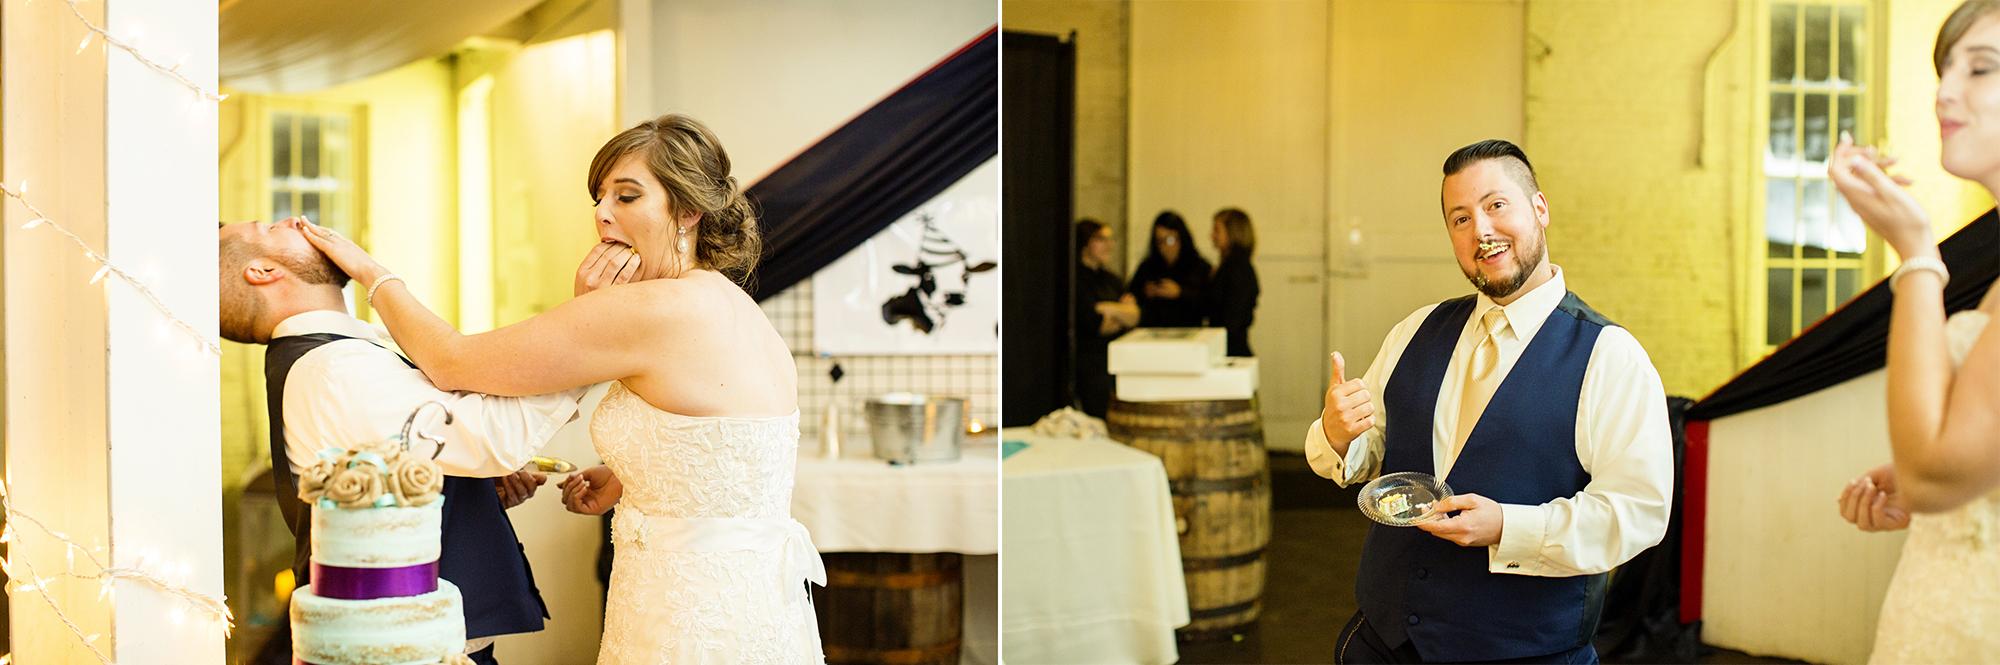 Seriously_Sabrina_Photography_Lexington_Kentucky_21c_Round_Barn_Red_Mile_Wedding_Gorley_109.jpg